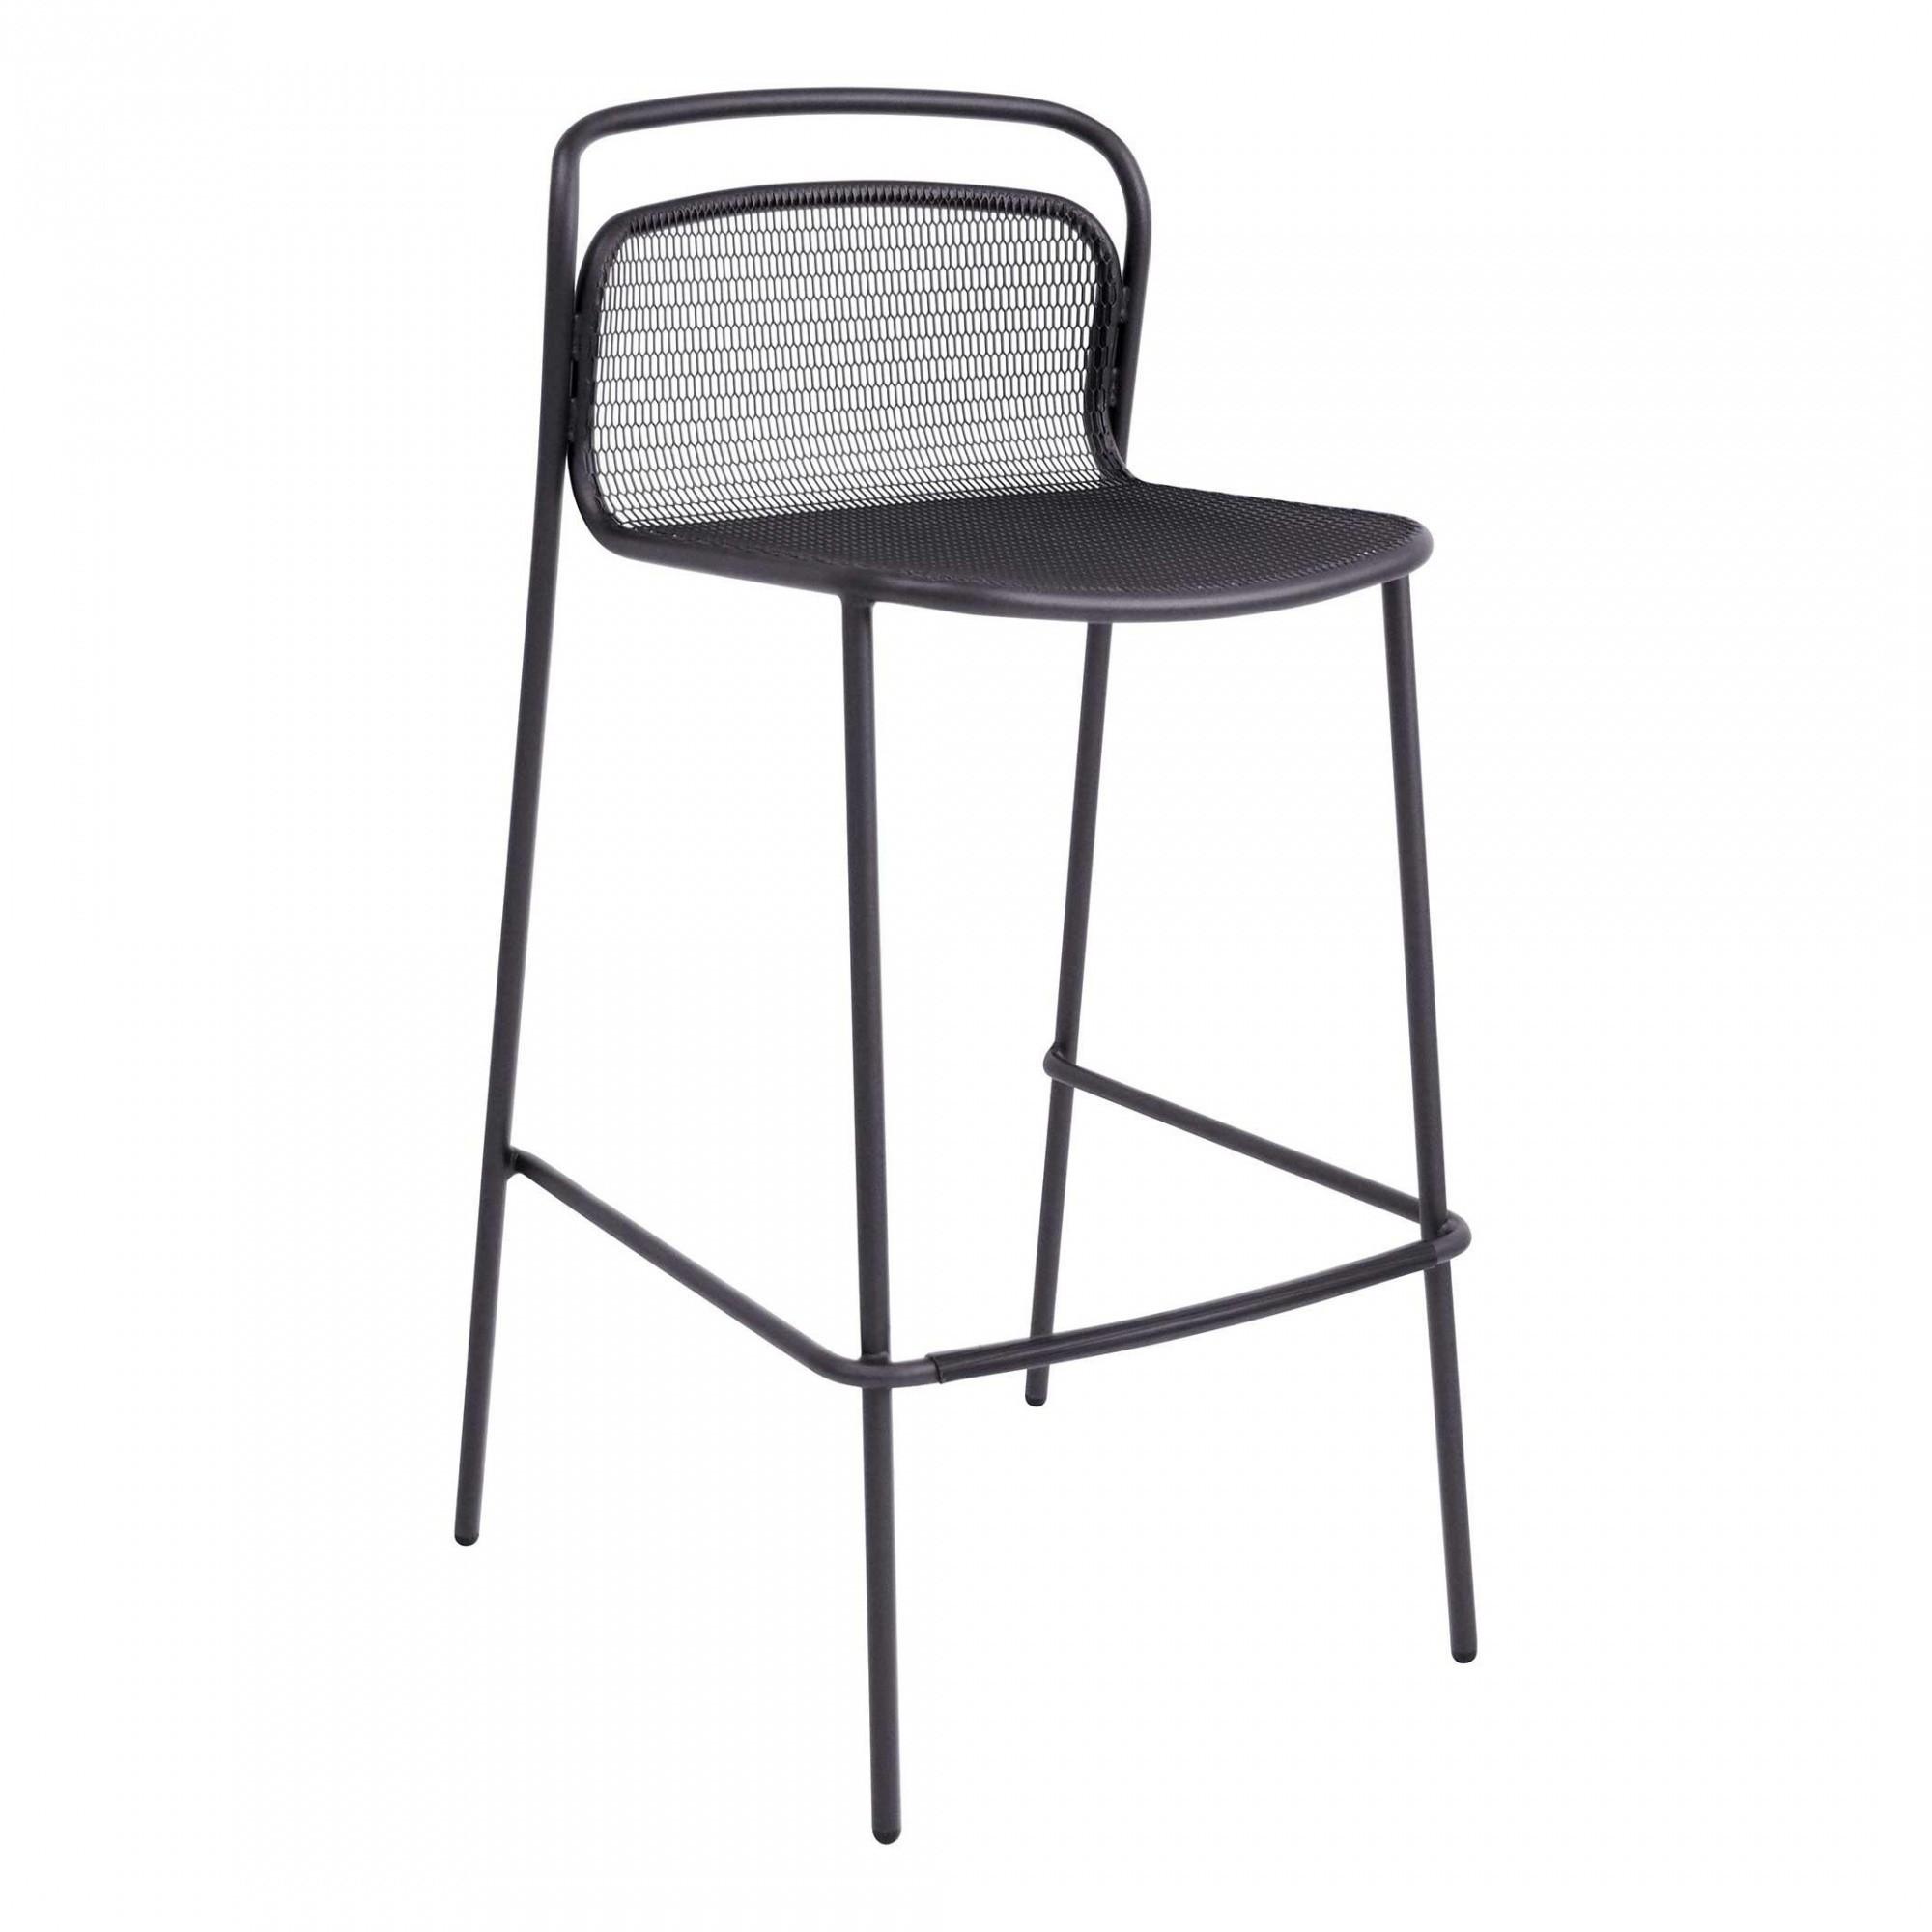 Stupendous Modern Outdoor Bar Stool Andrewgaddart Wooden Chair Designs For Living Room Andrewgaddartcom